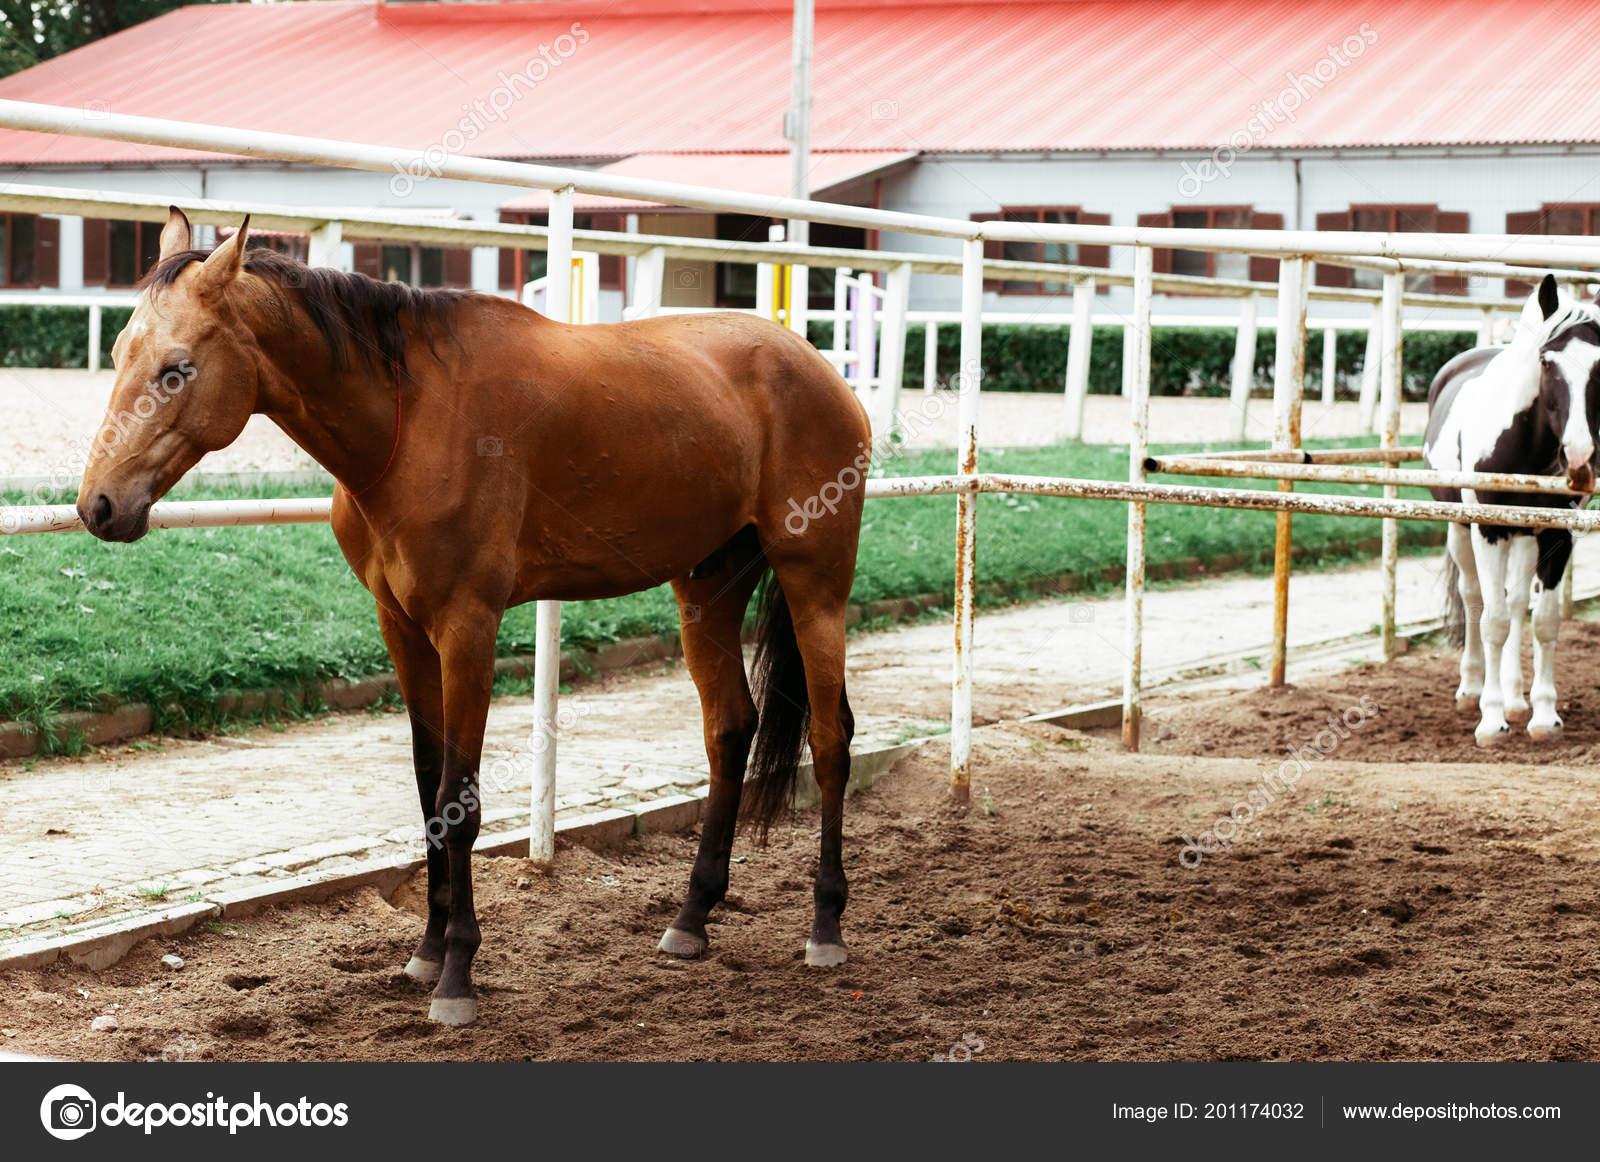 Beautiful Horses Animals Pasture Stables Horseback Riding Stock Photo C Vitizh 201174032